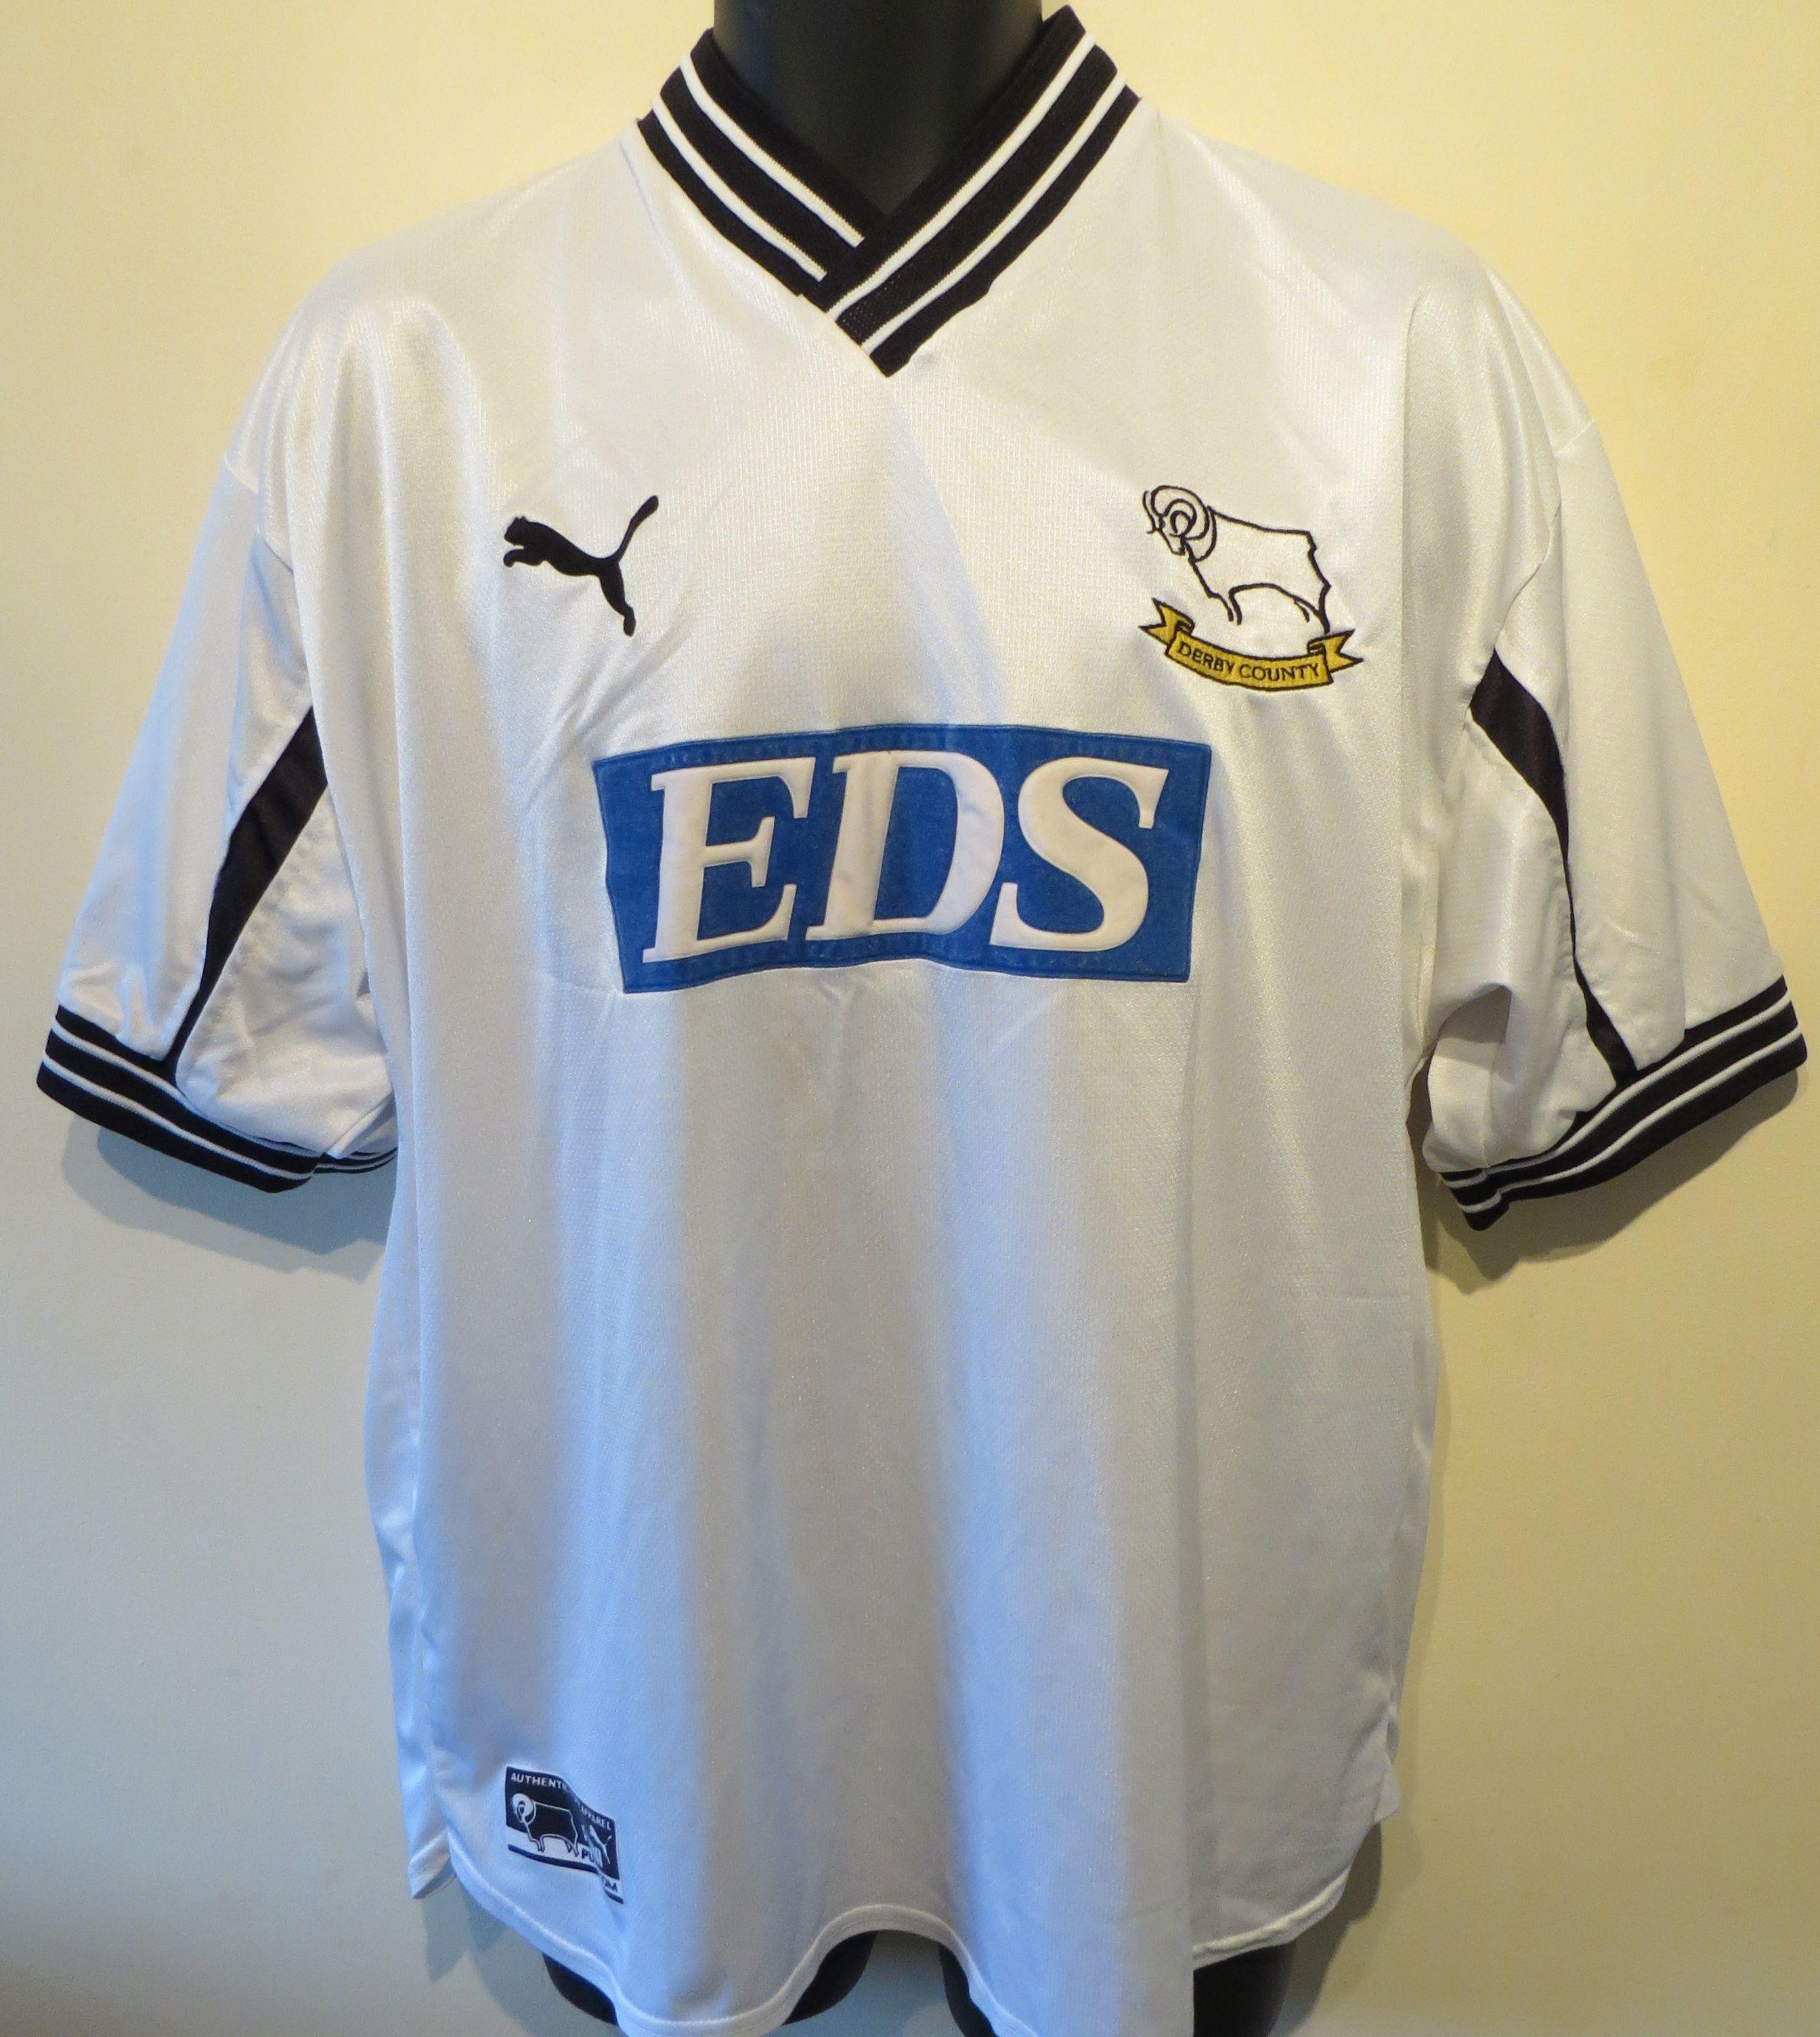 6c0d16d740d Classic Football Shirts Derby County - BCD Tofu House